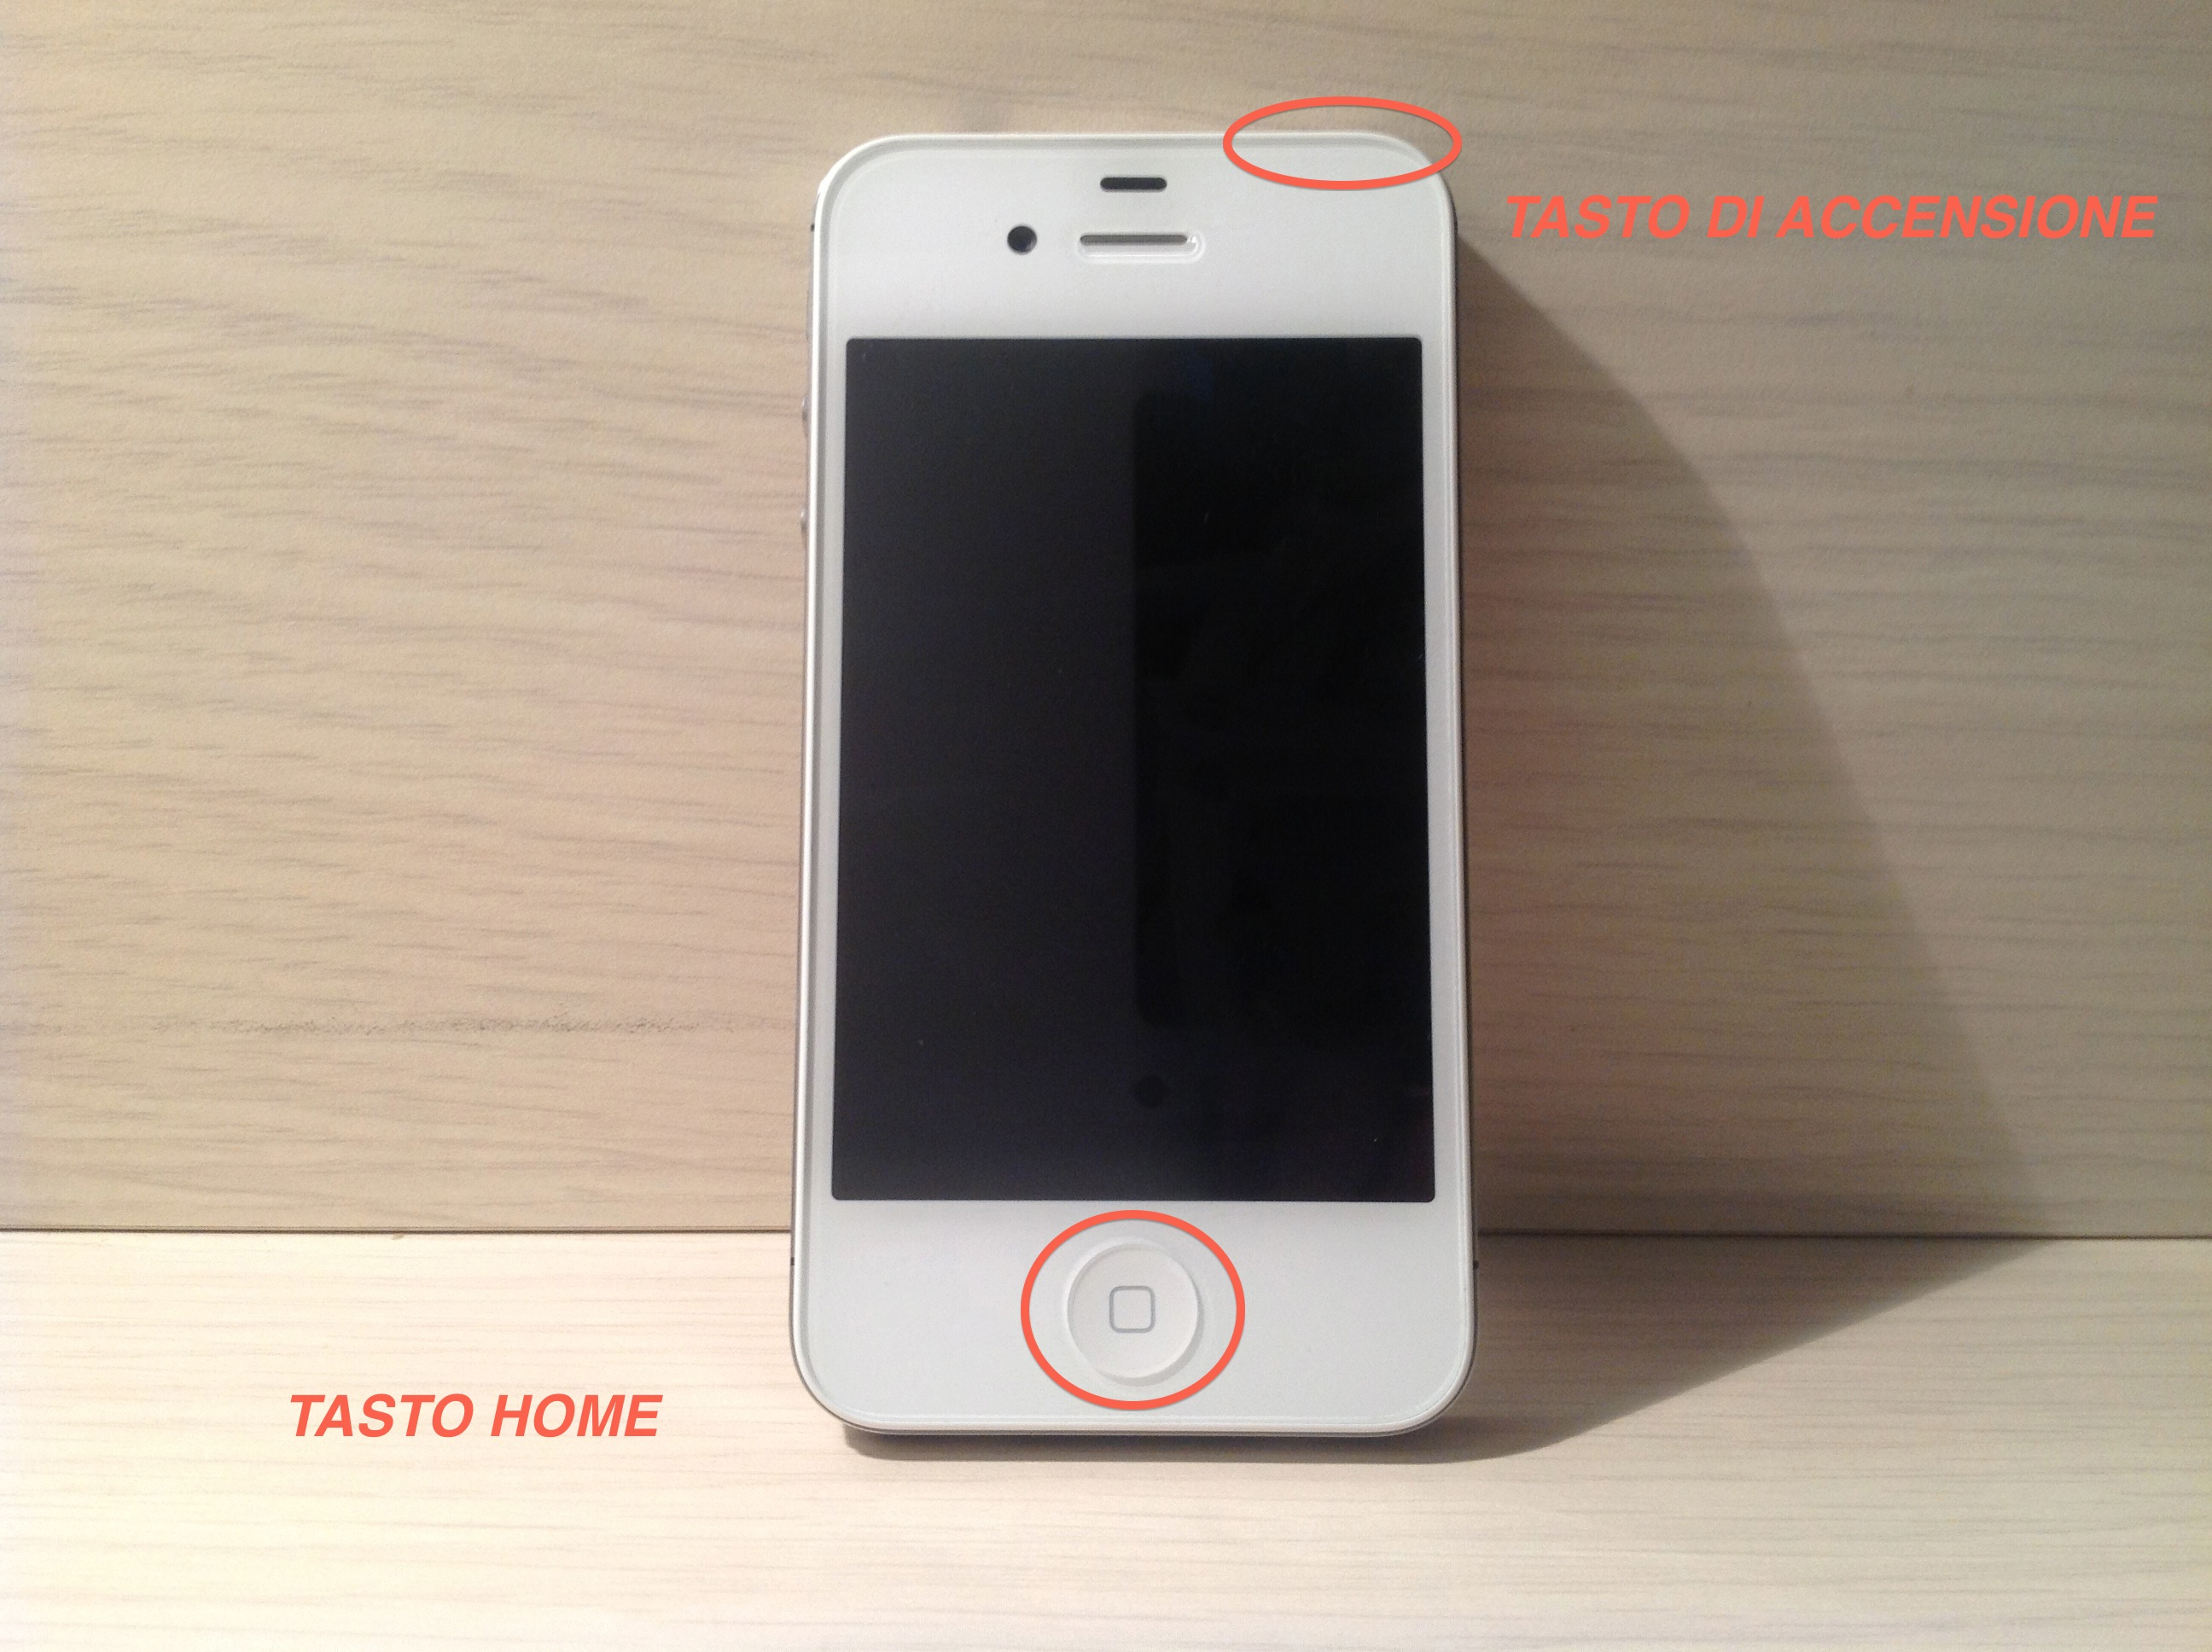 tutorial come mettere liphone in modalit dfu manuale iphone italia blog